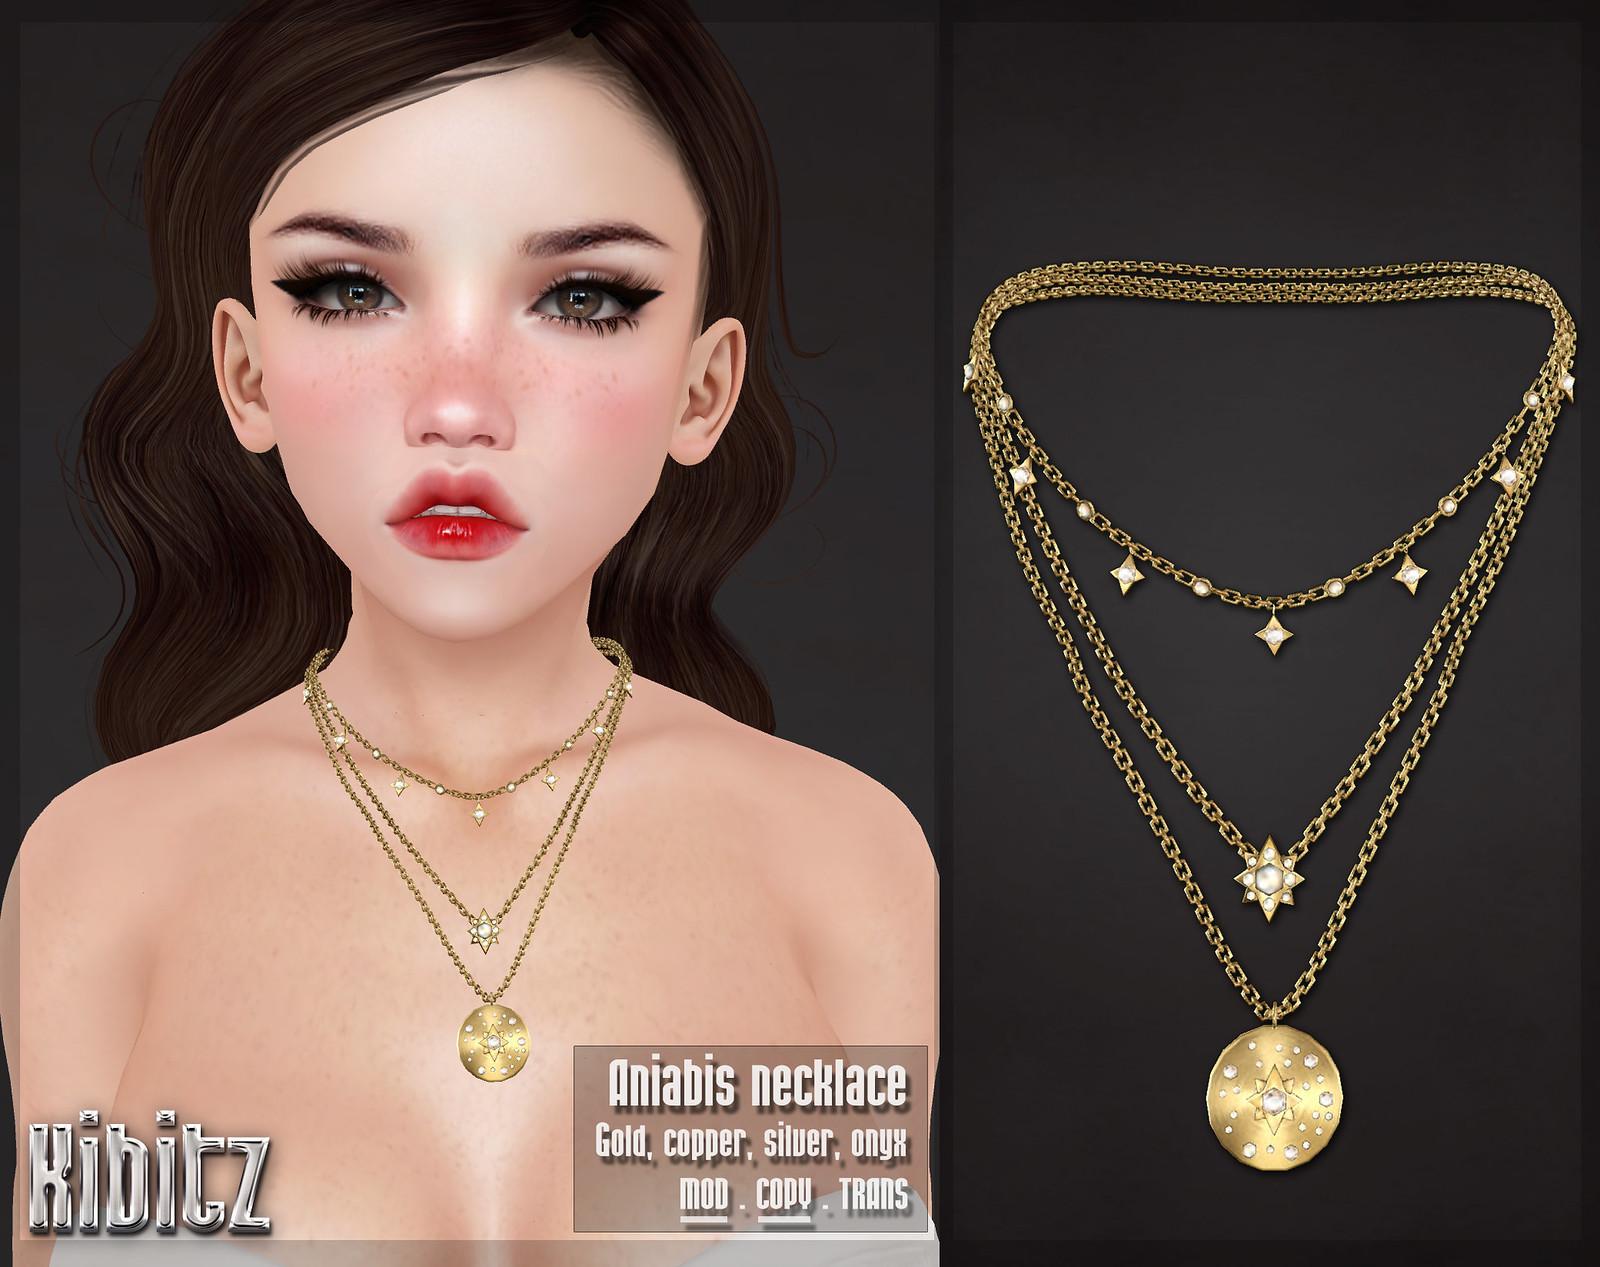 kibitz aniabis necklace vendor